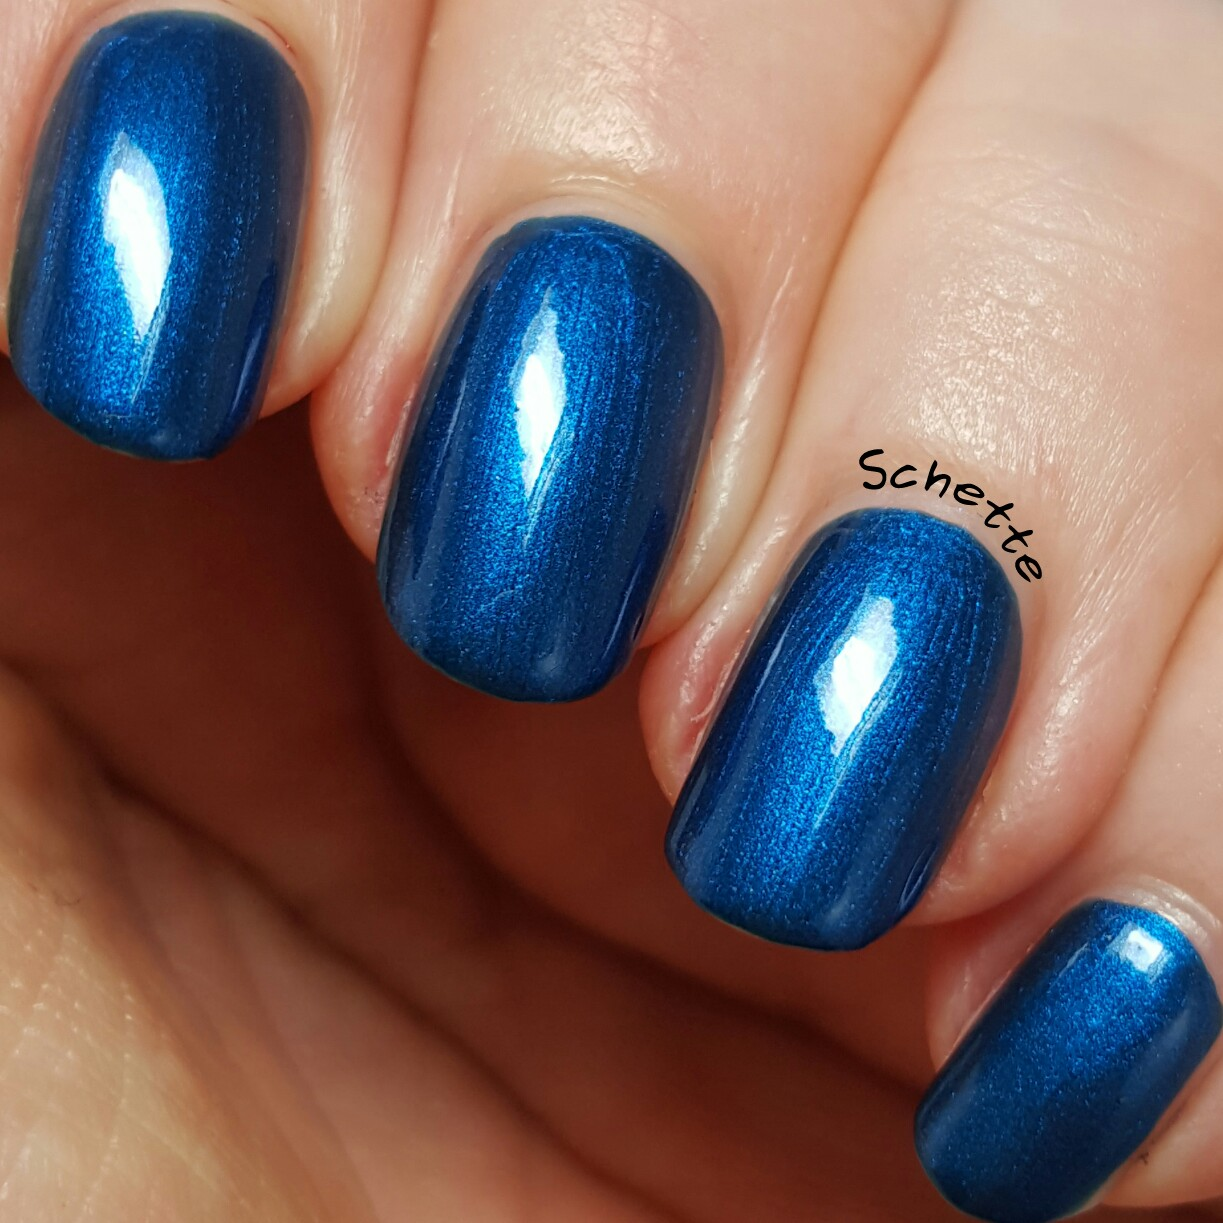 OPI - Unforgretably blue